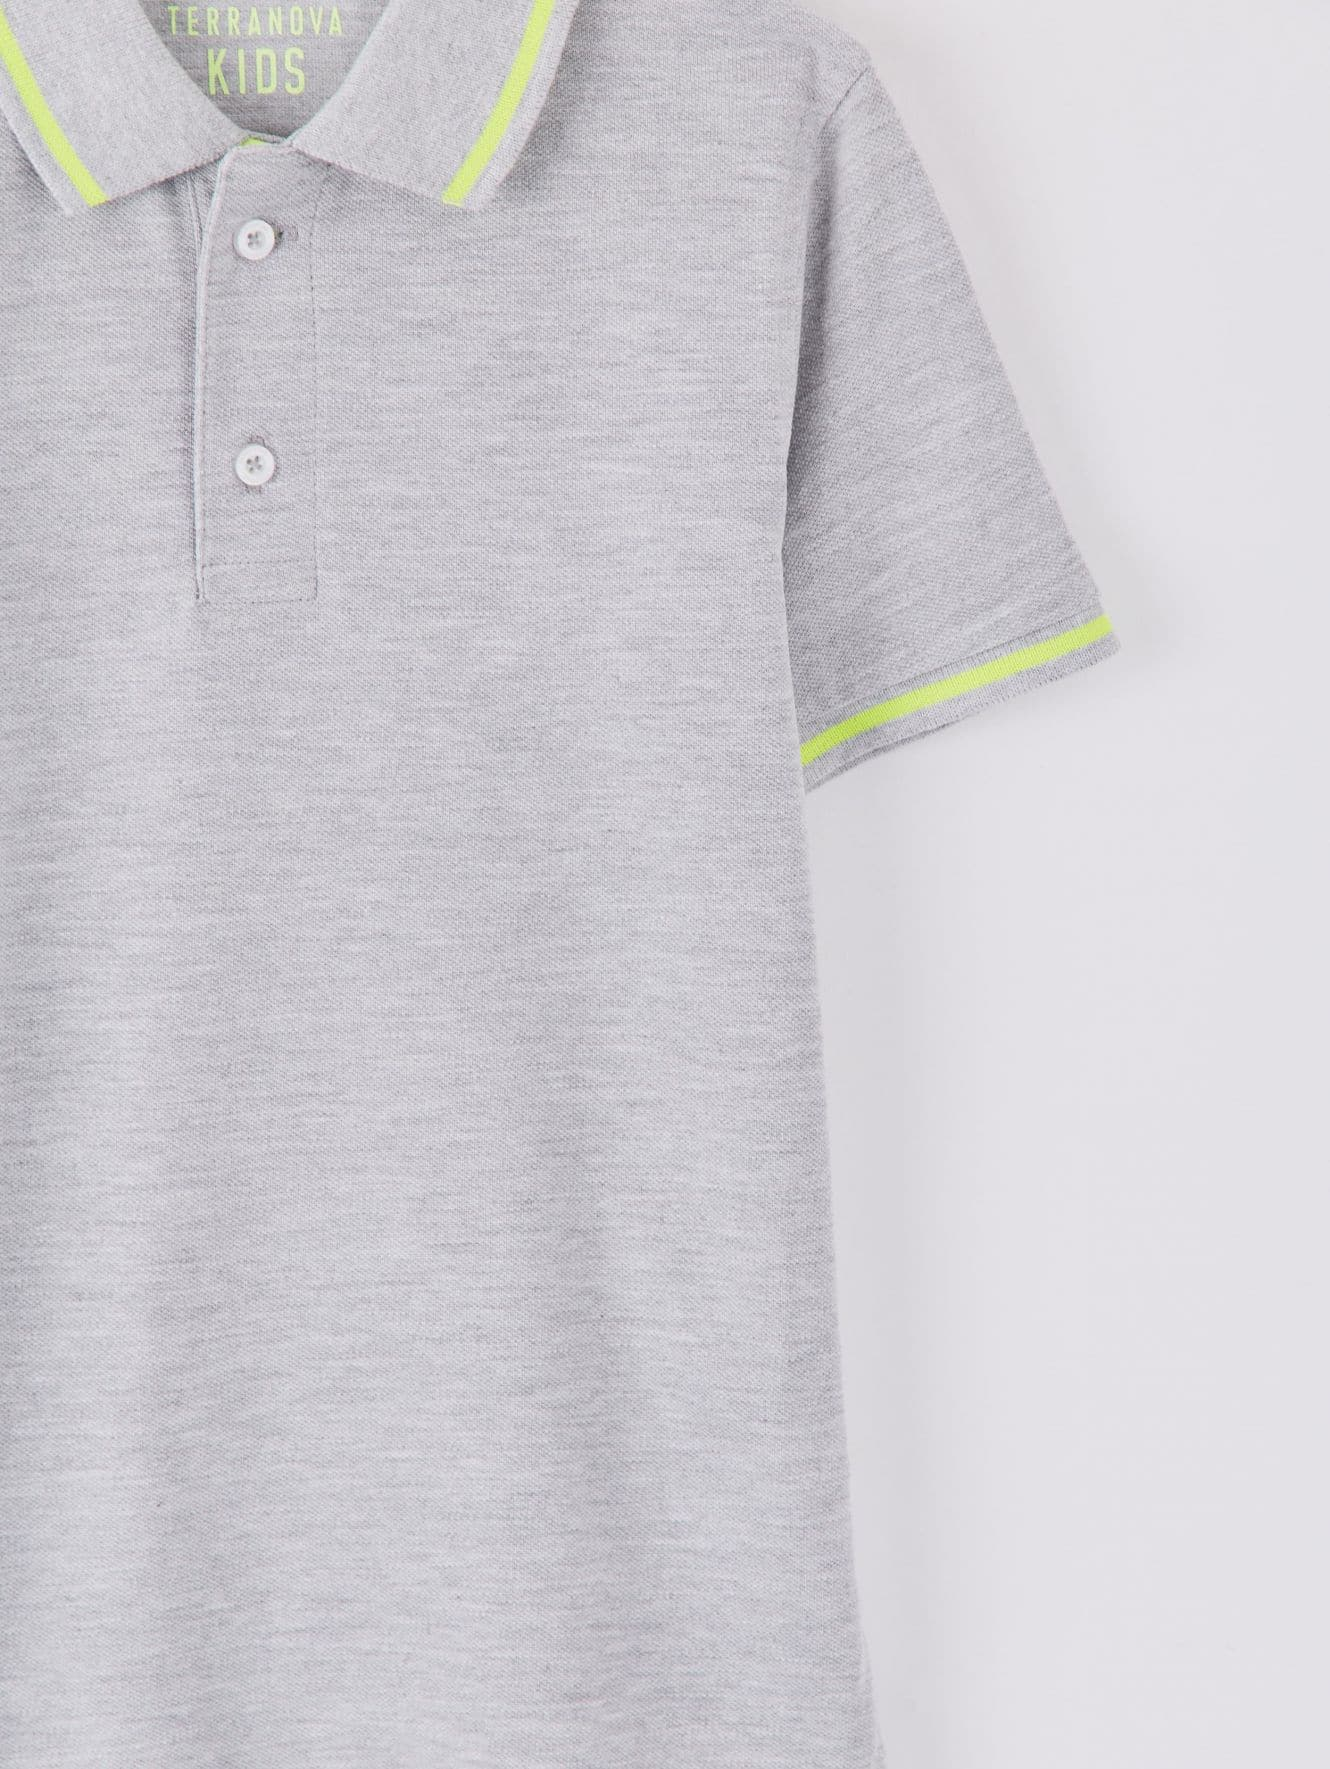 T-Shirt nino Terranova